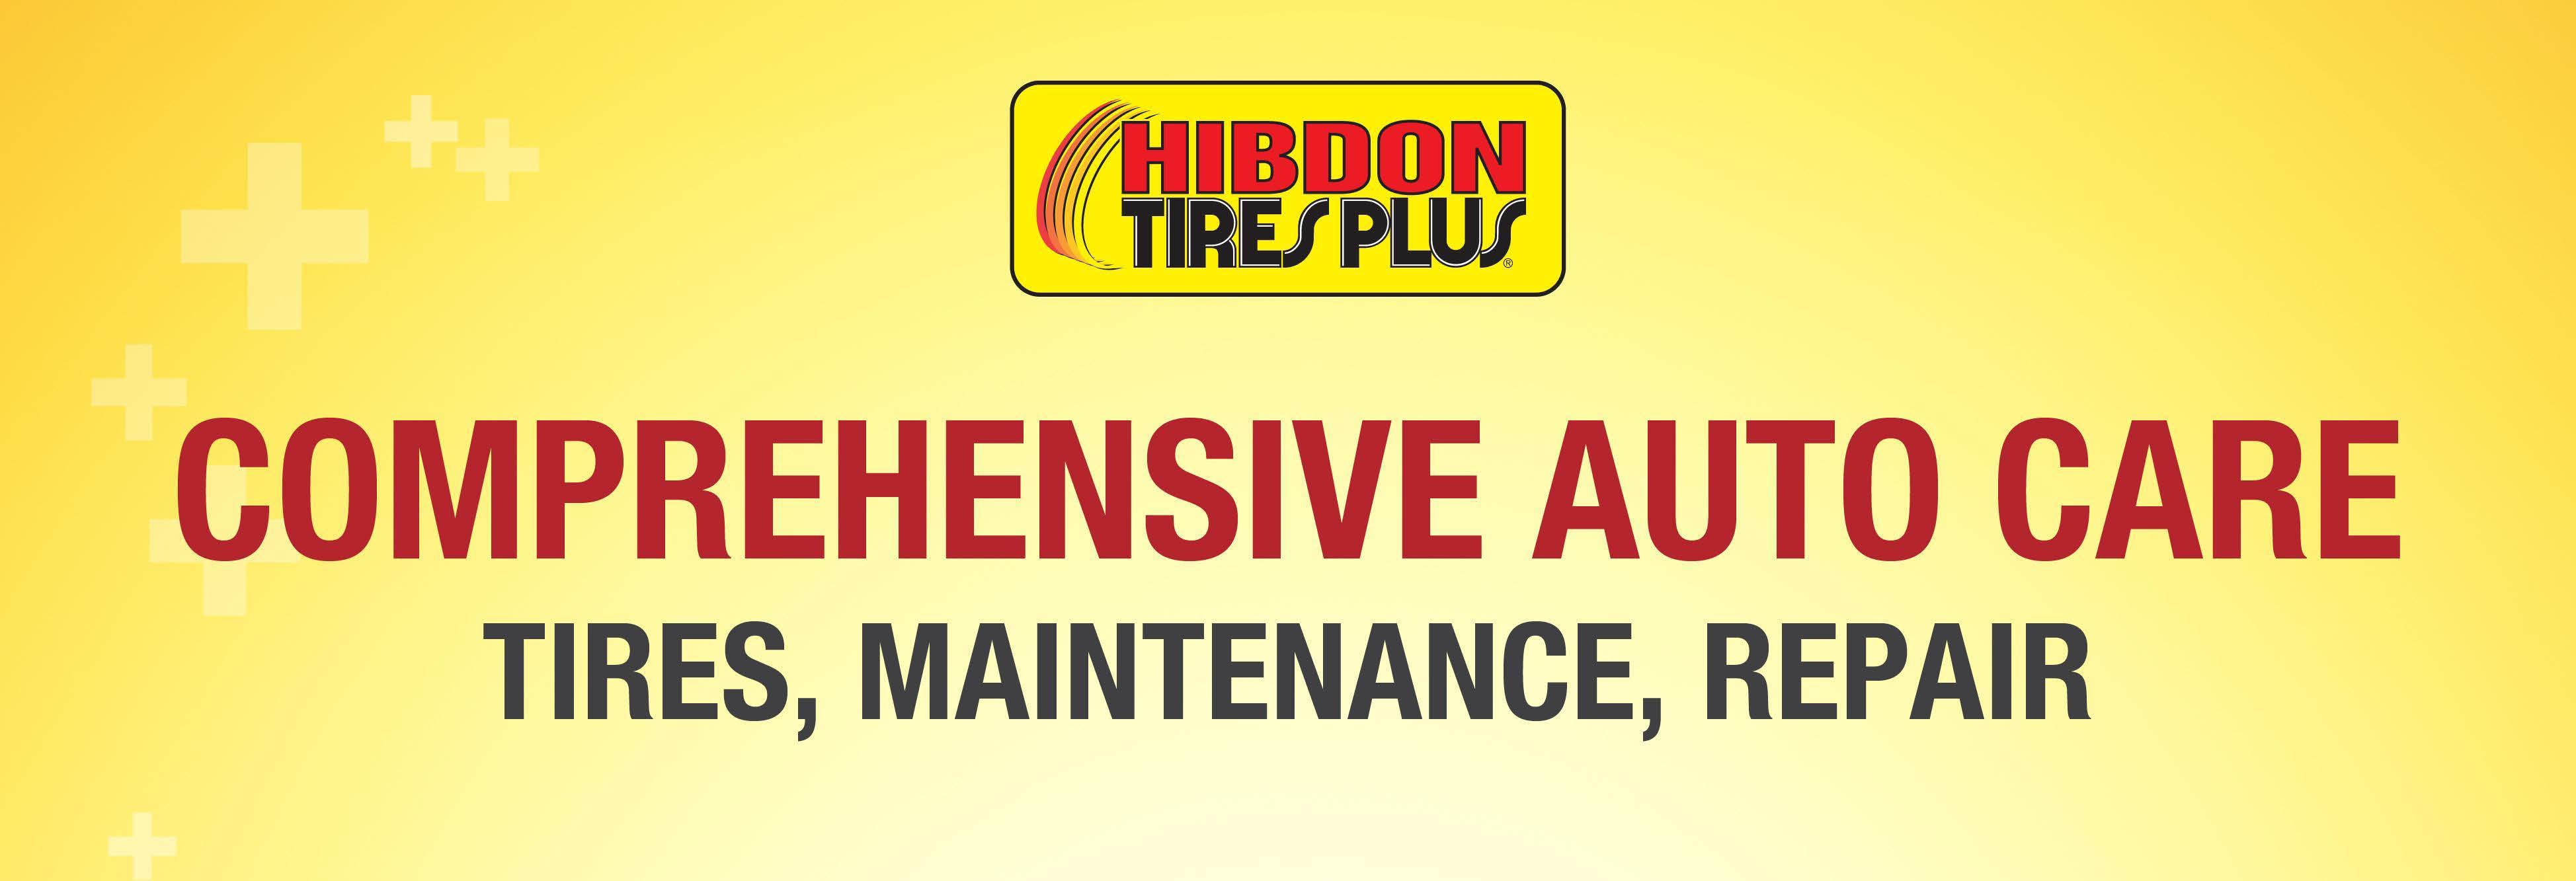 Tires Plus Hibdon Oil Change Coupon Www Imagenesmi Com